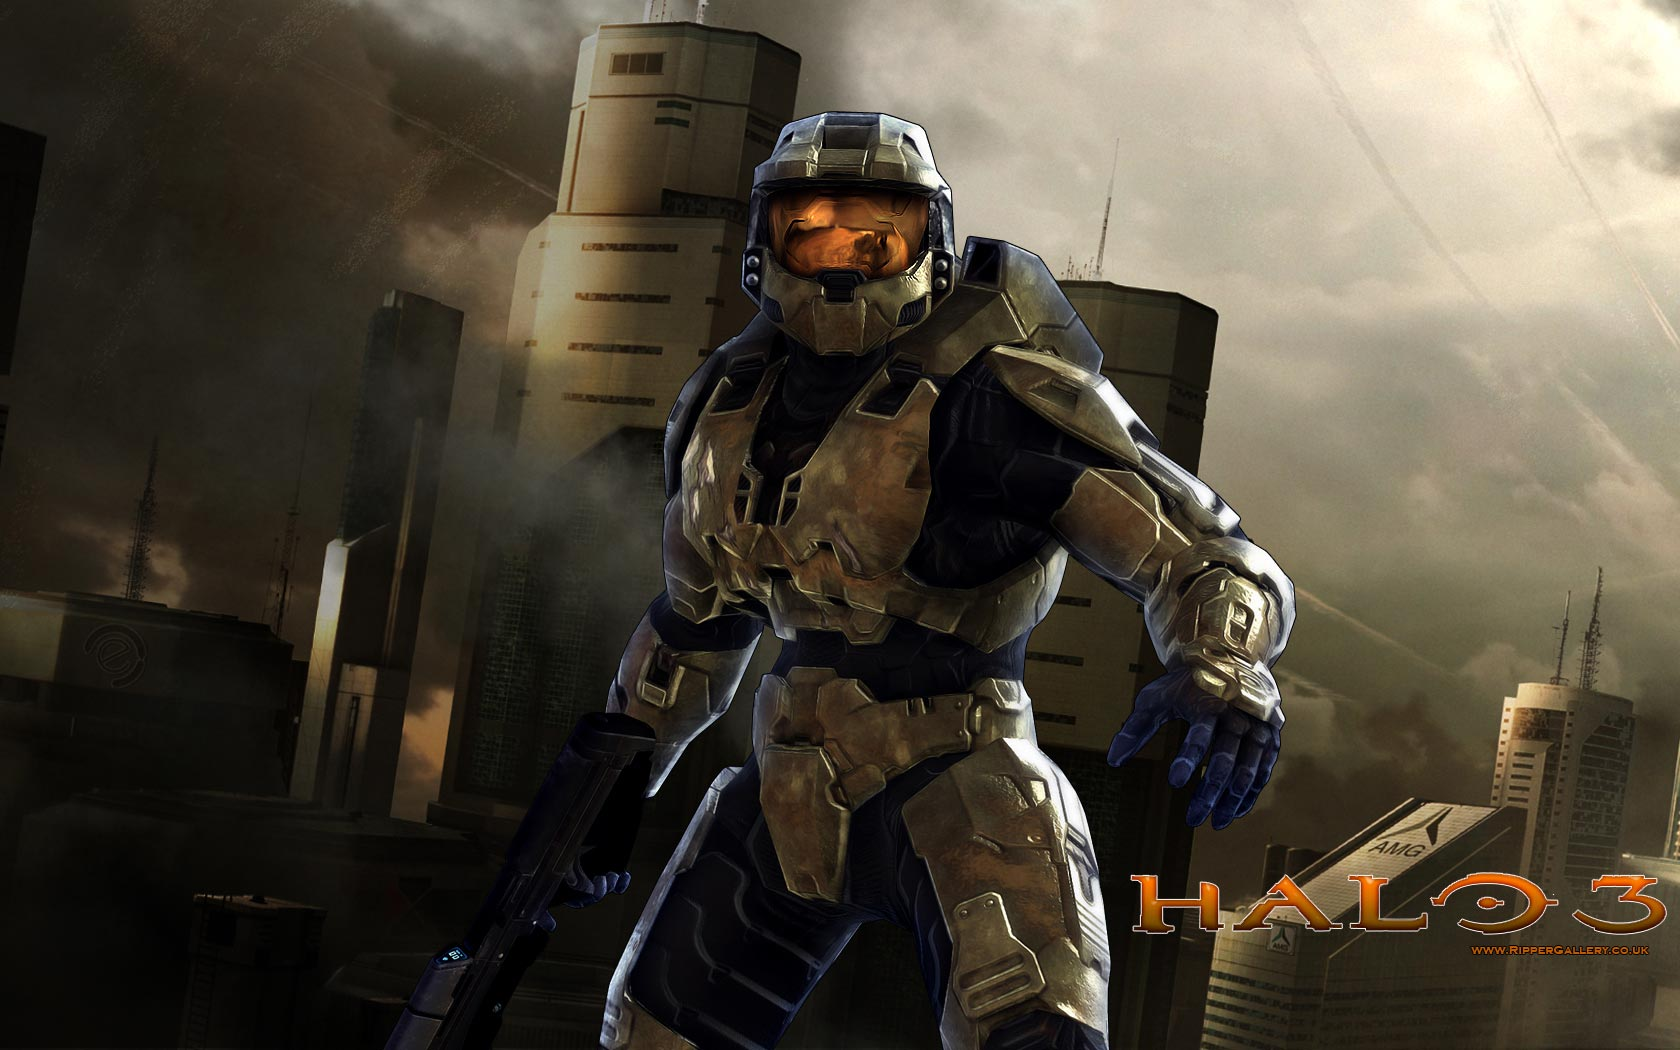 Widescreen HD Wallpaper Games Halo 3 series video game hd 1680x1050